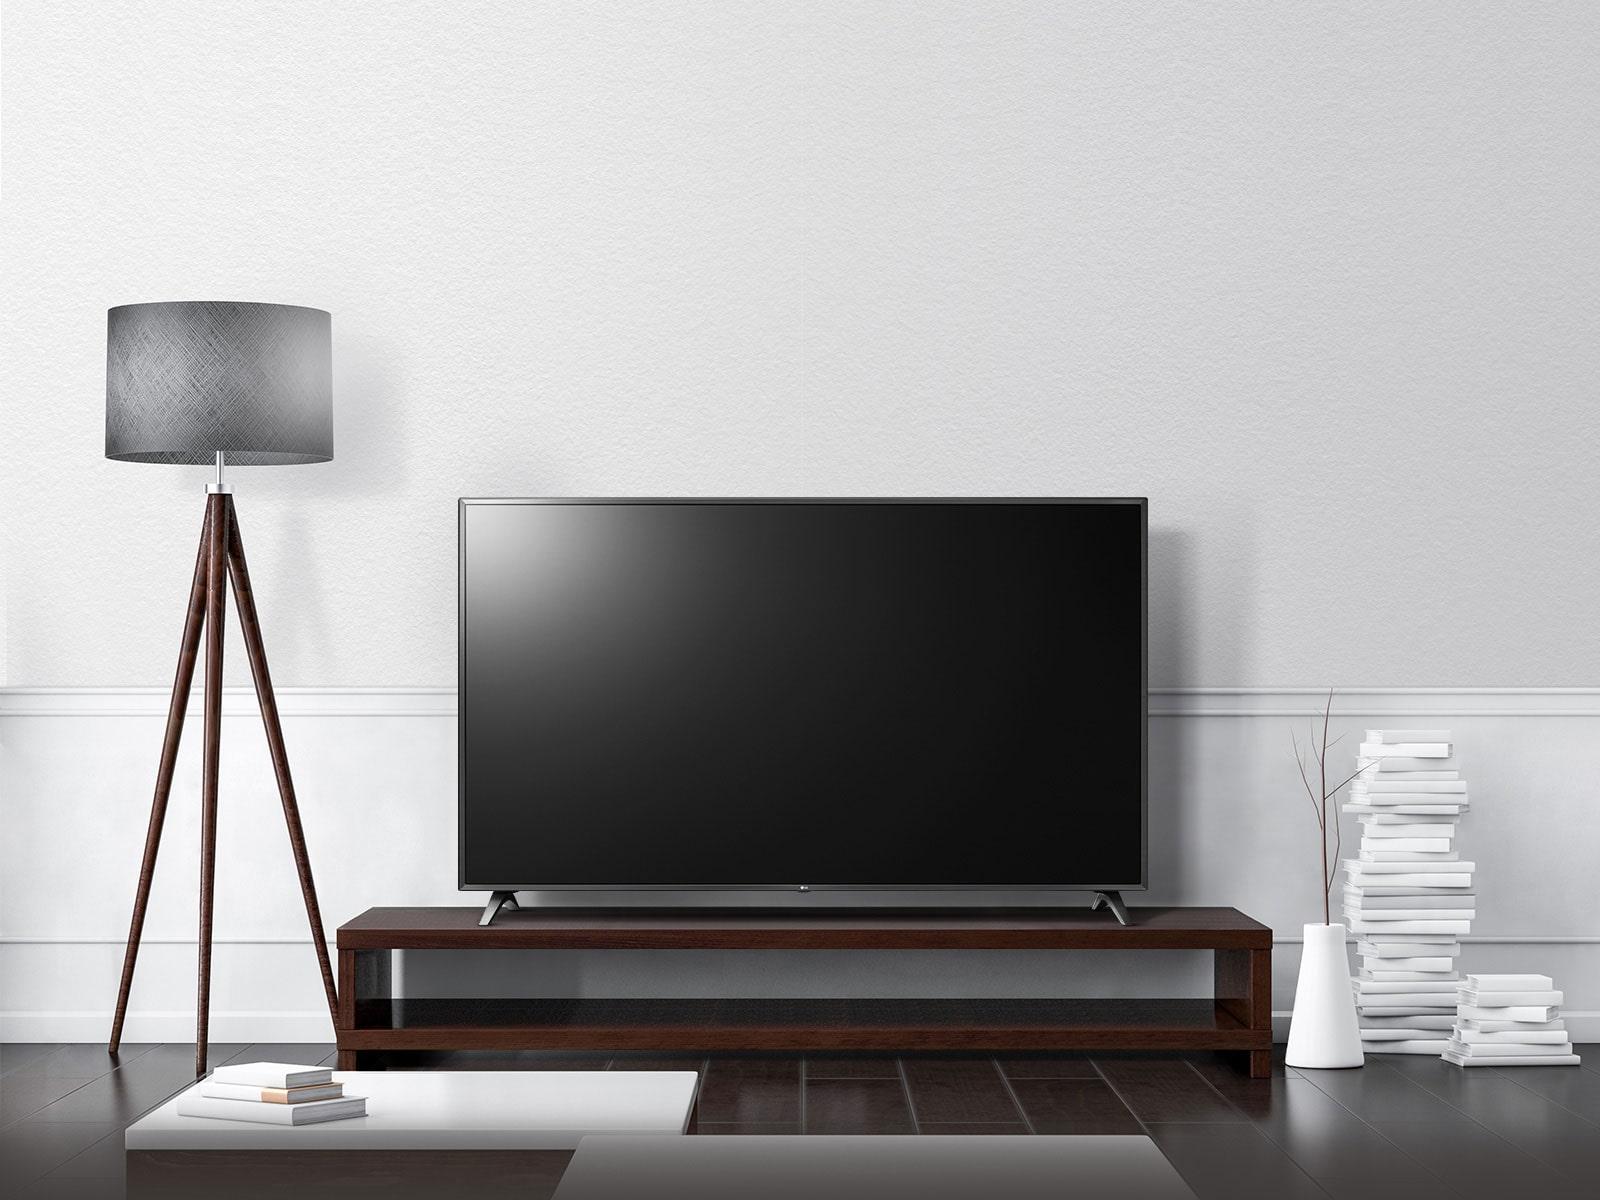 TV-UHD-50-UM76-07-Design-Desktop1